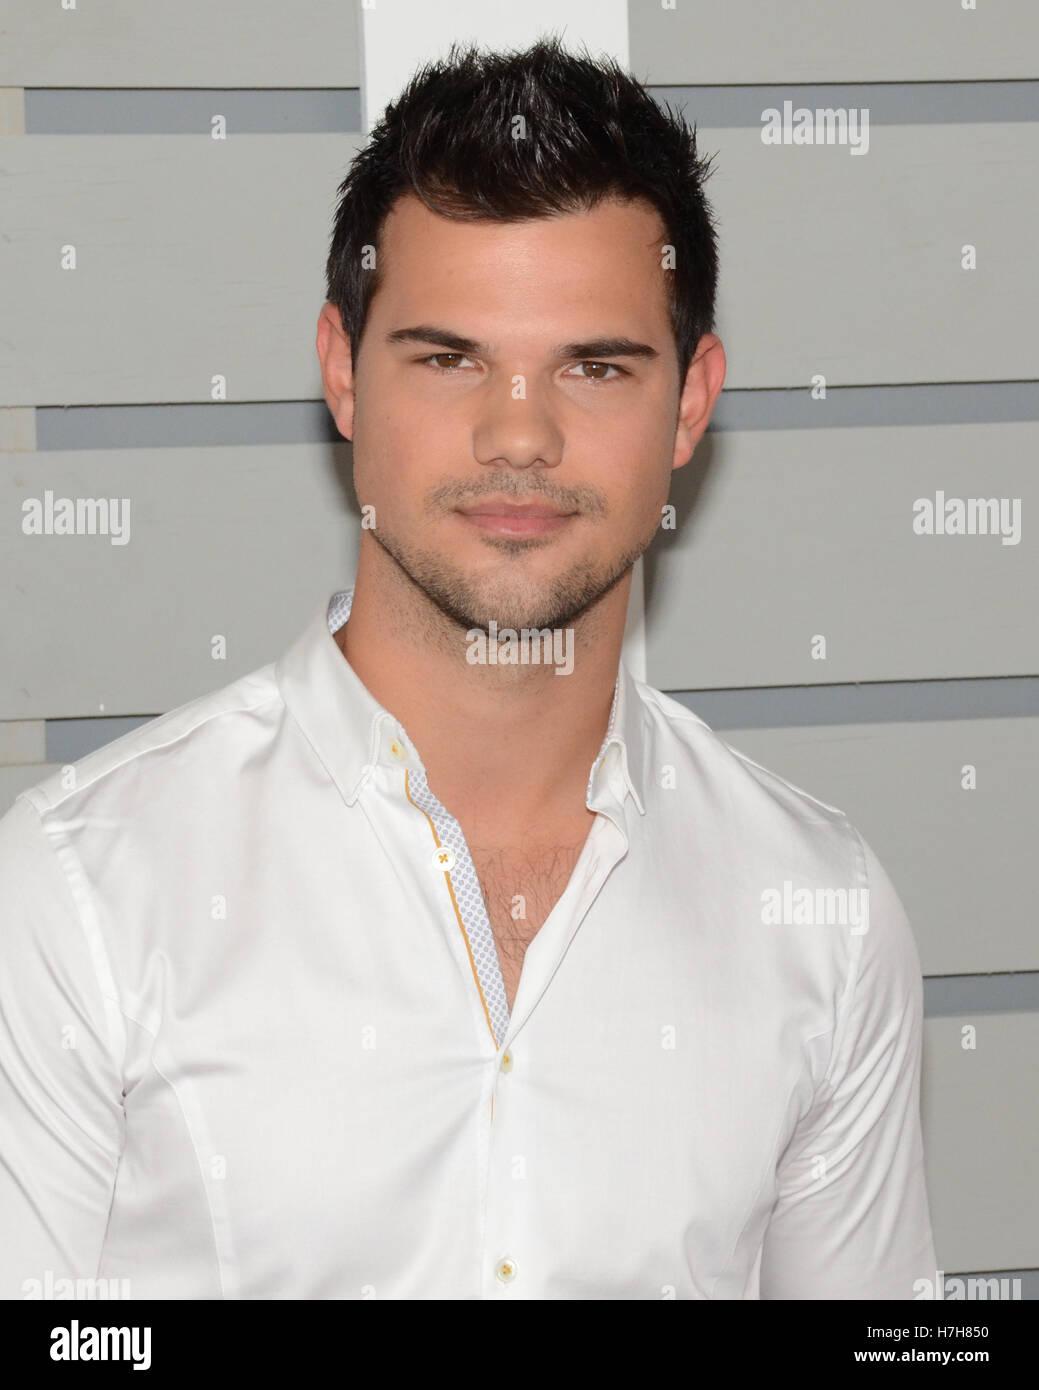 Arcadia California Usa 5th Nov 2016 Taylor Lautner Attends The